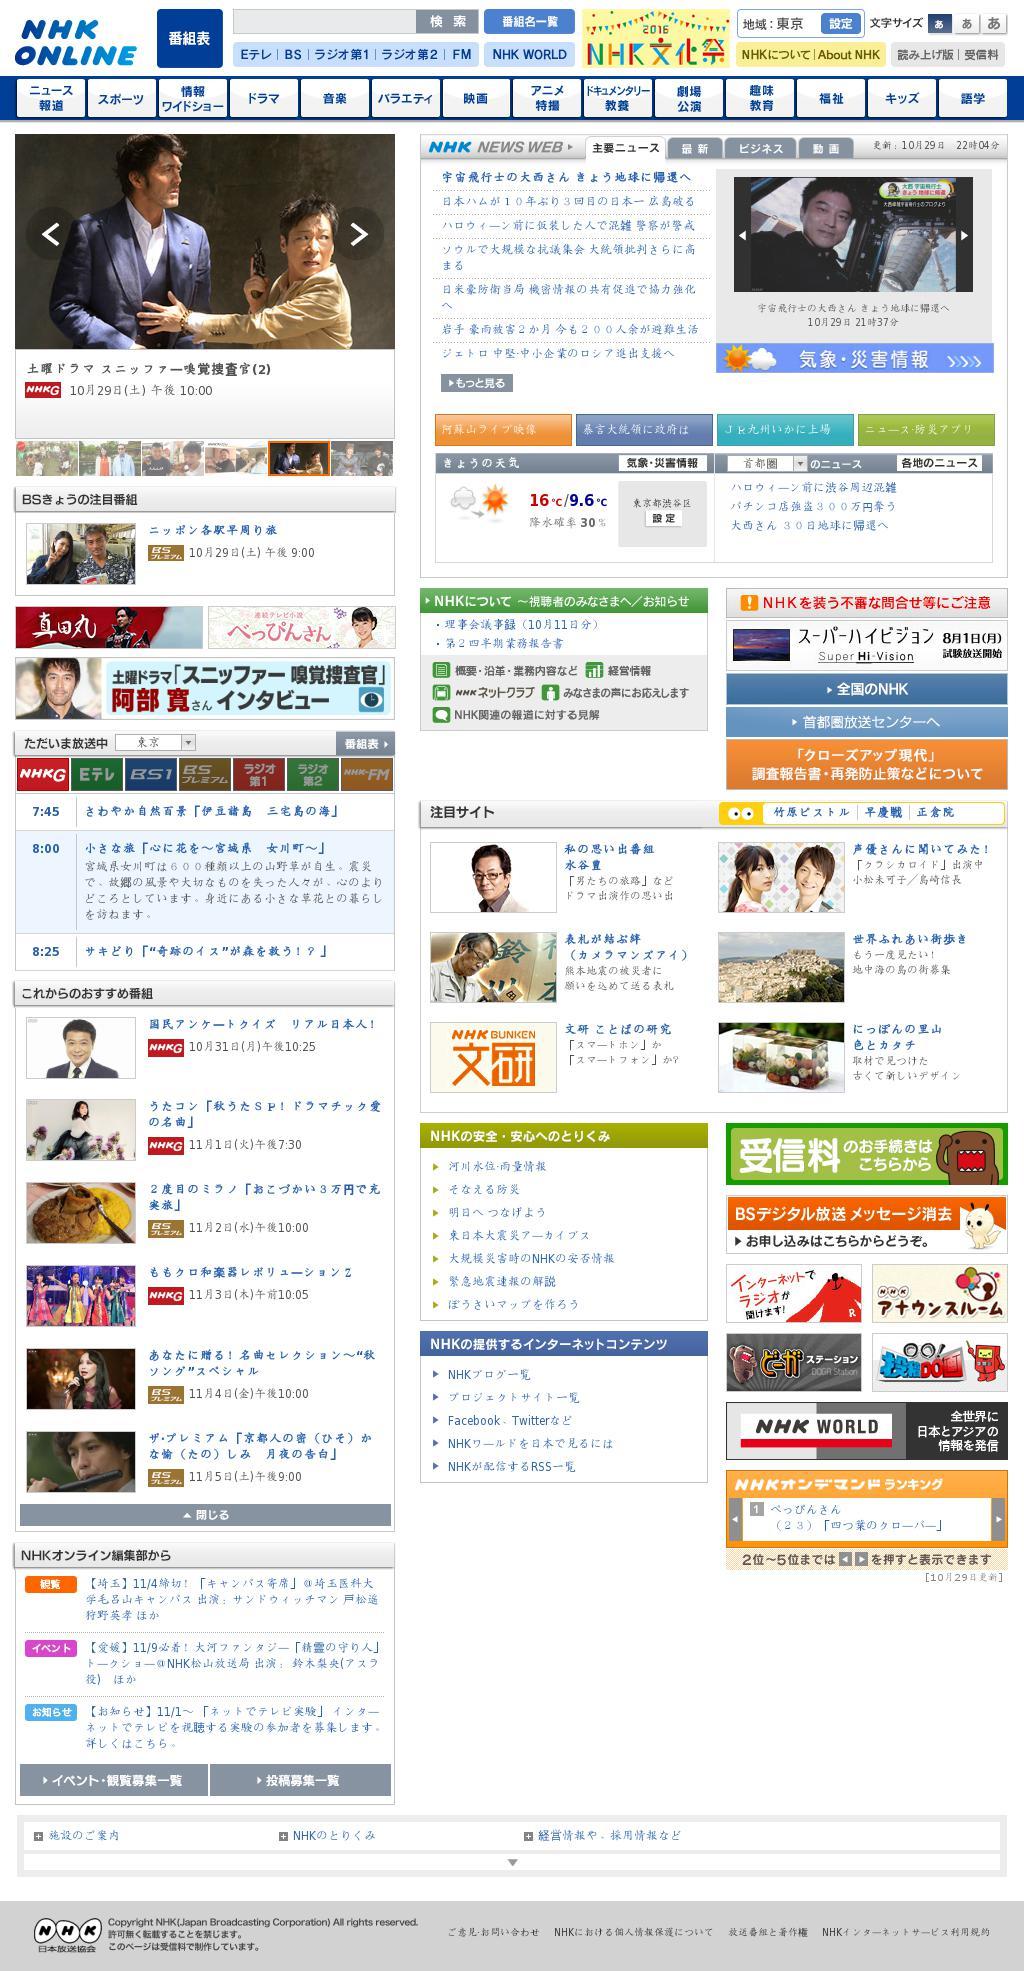 NHK Online at Saturday Oct. 29, 2016, 11:13 p.m. UTC